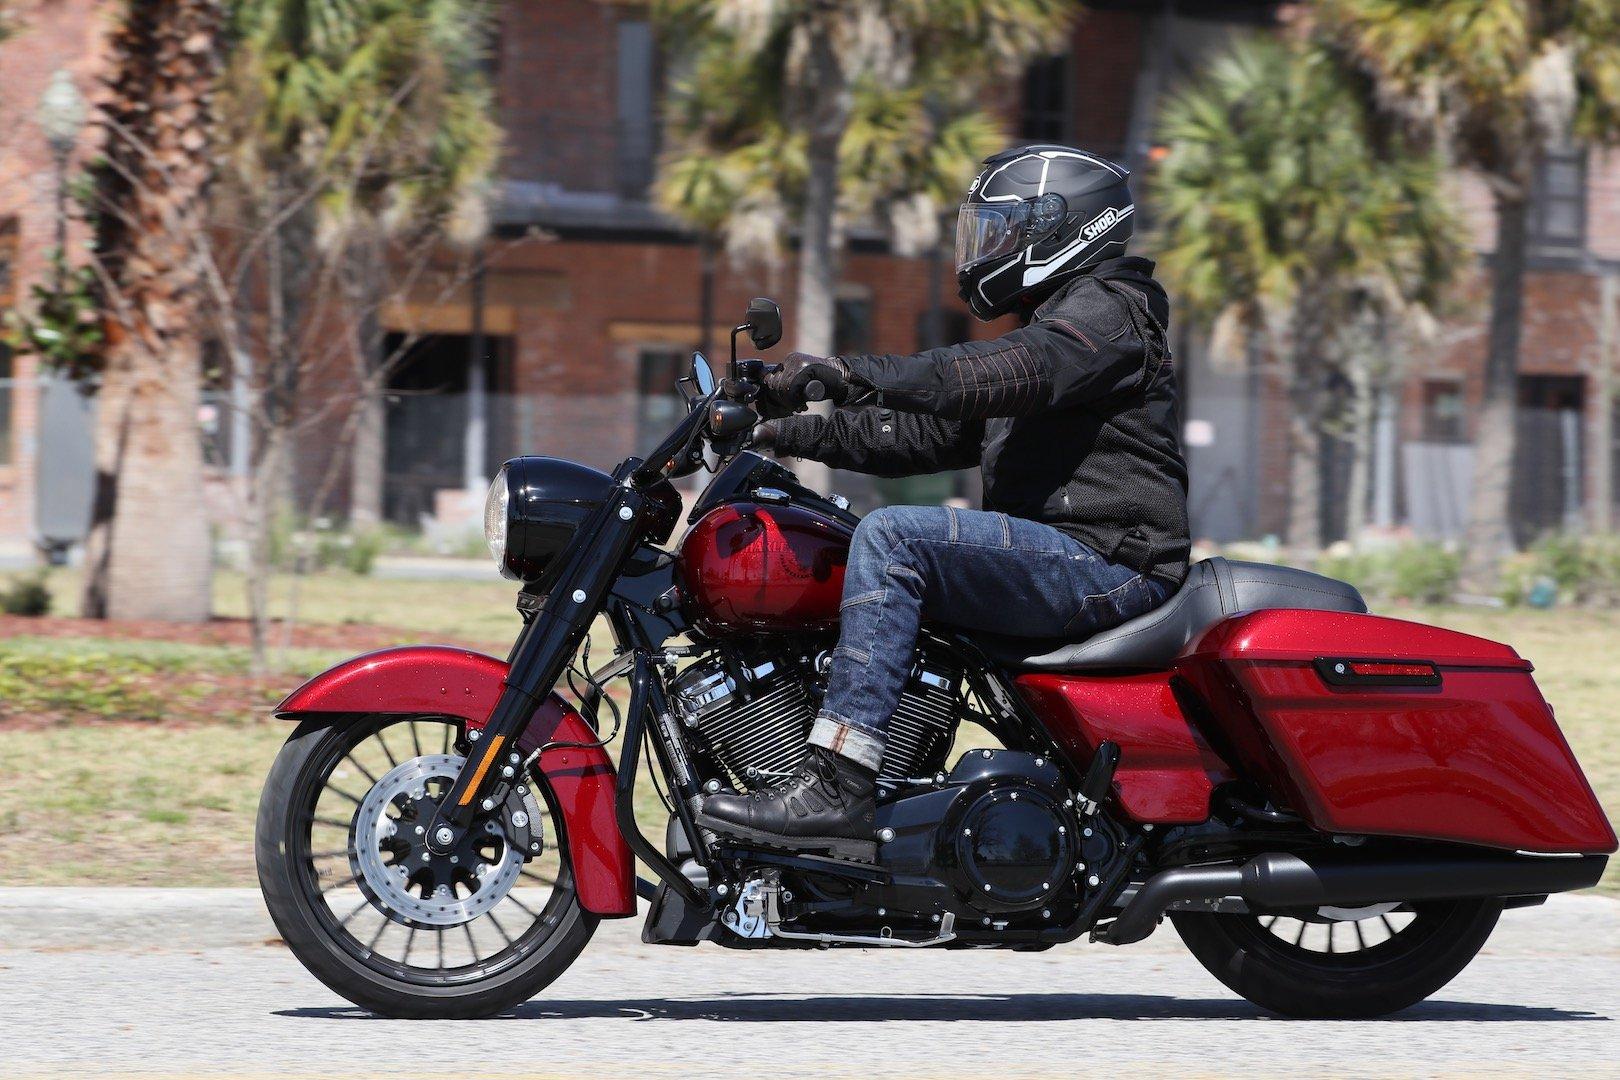 2017 Harley-Davidson Road King Special Review | Bike Week Test